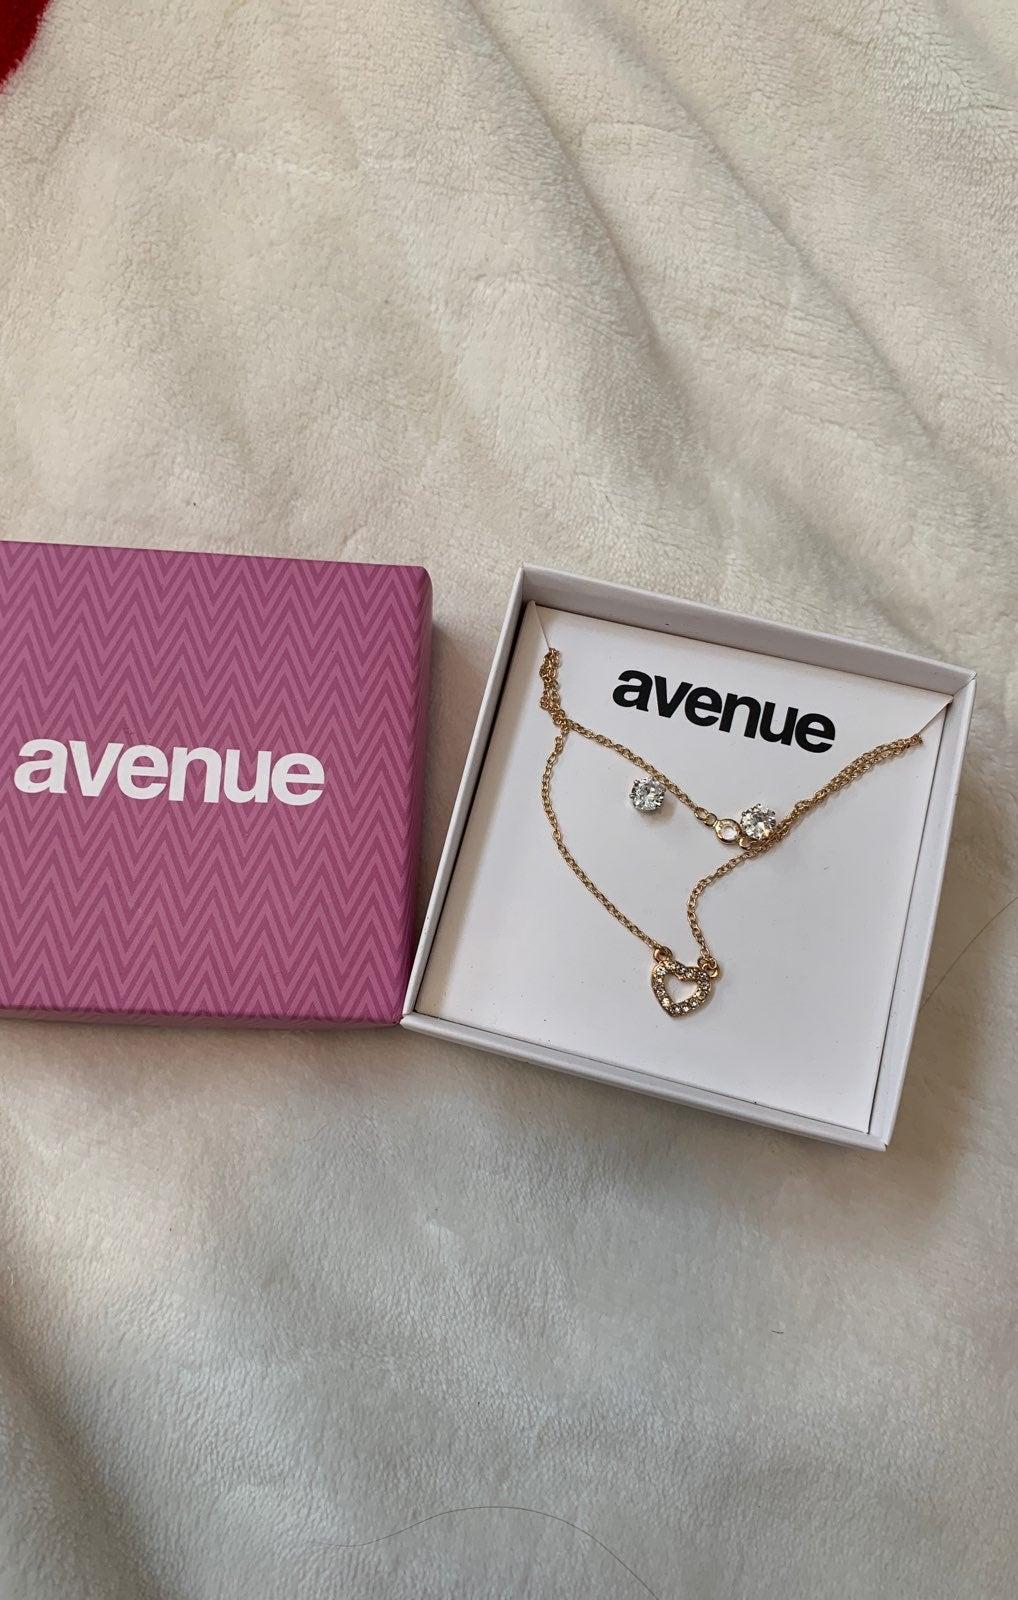 Avenue jewelry set